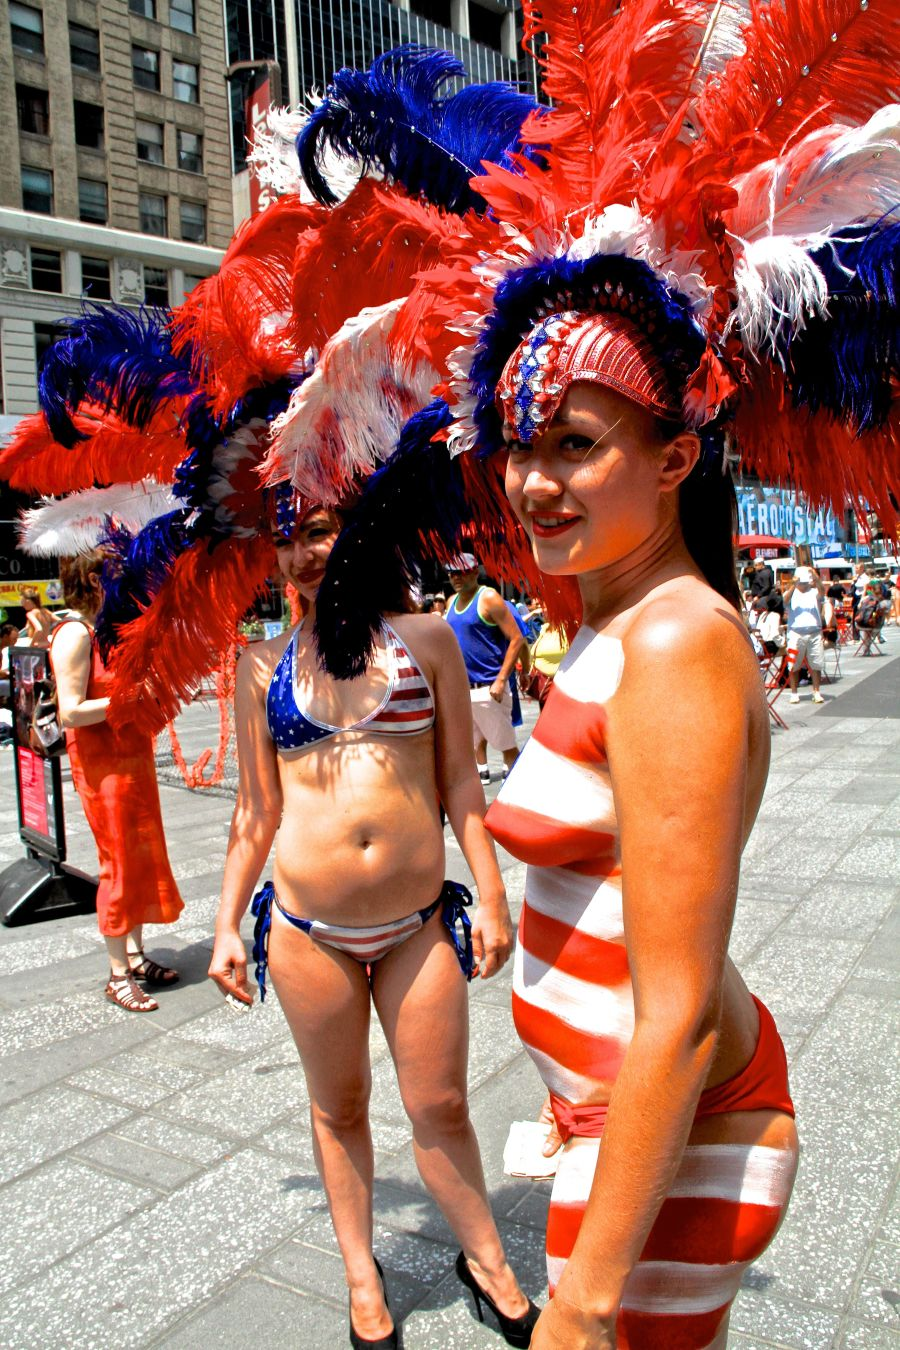 new york city times square woman in bikini naked woman 2